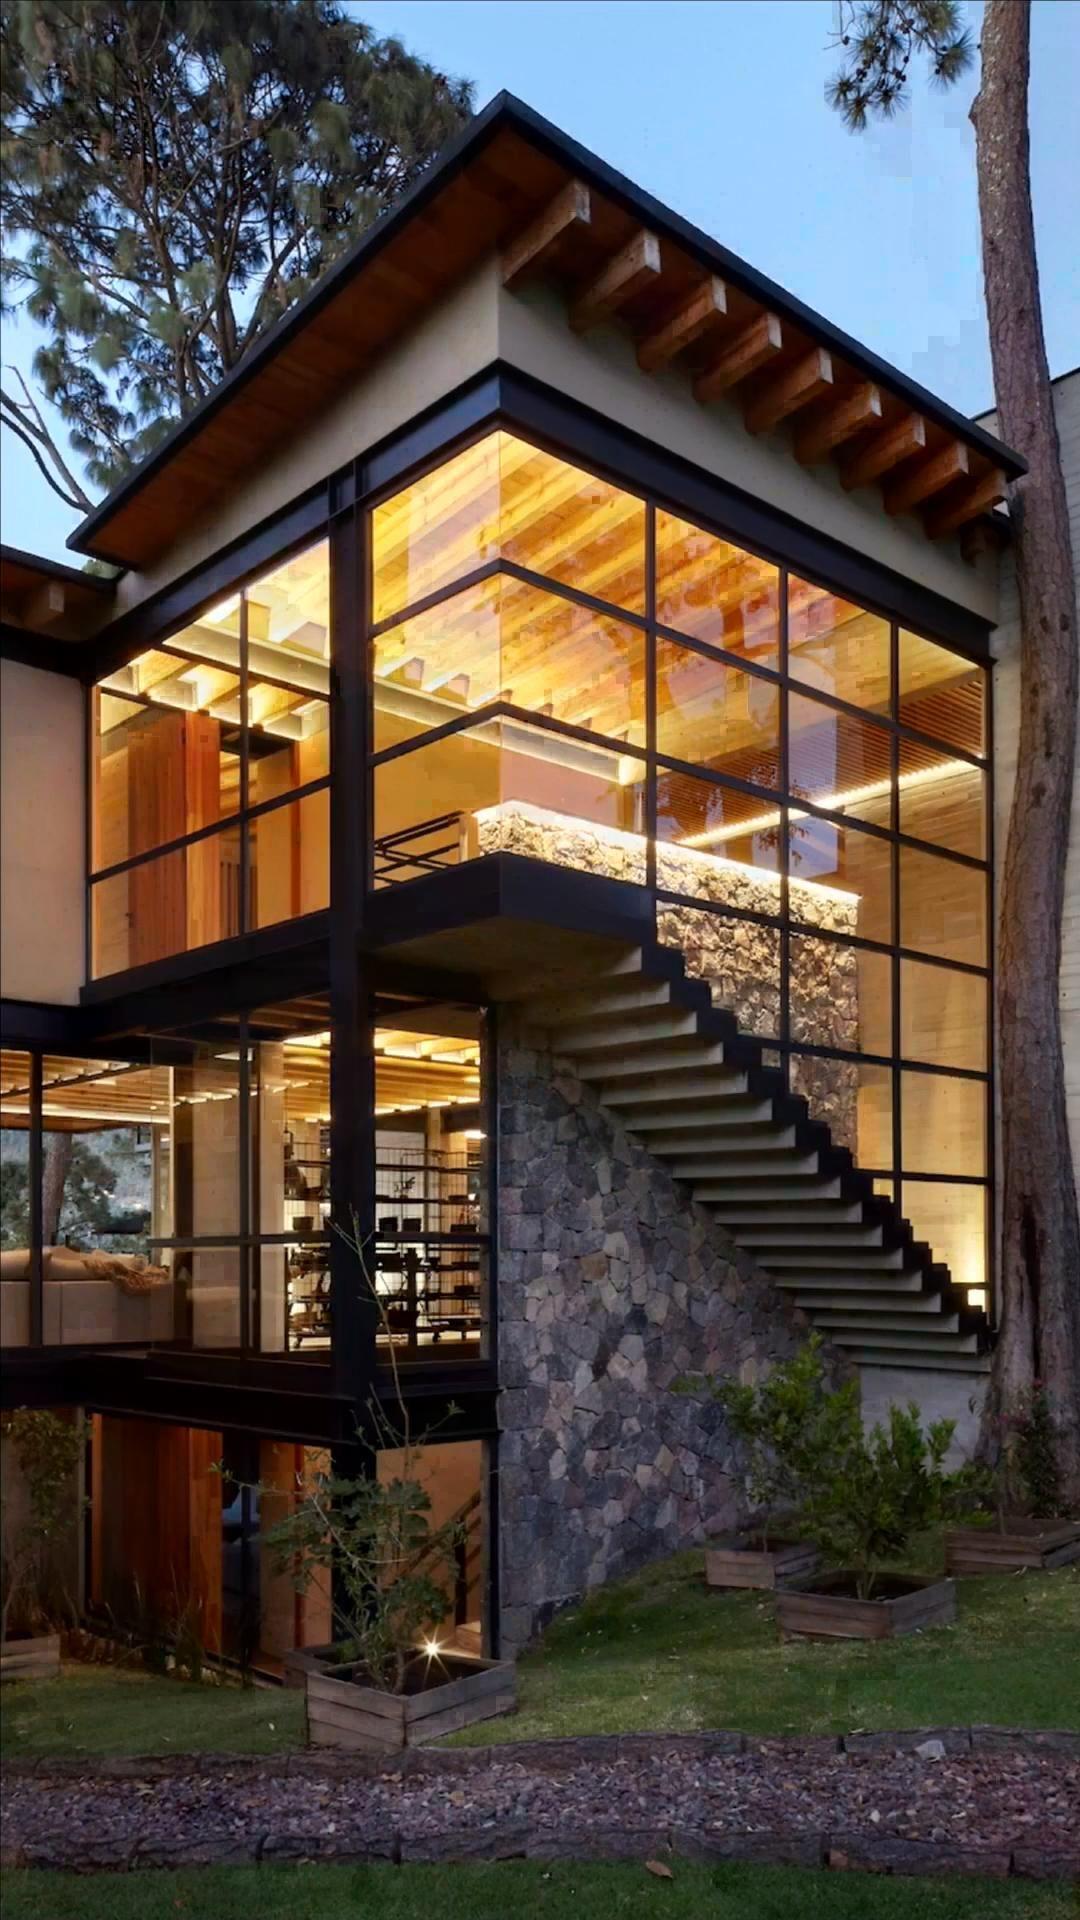 Lake View House (Casa Vista Del Lago) in Valle De Bravo, Mexico by D+S Arquitectos